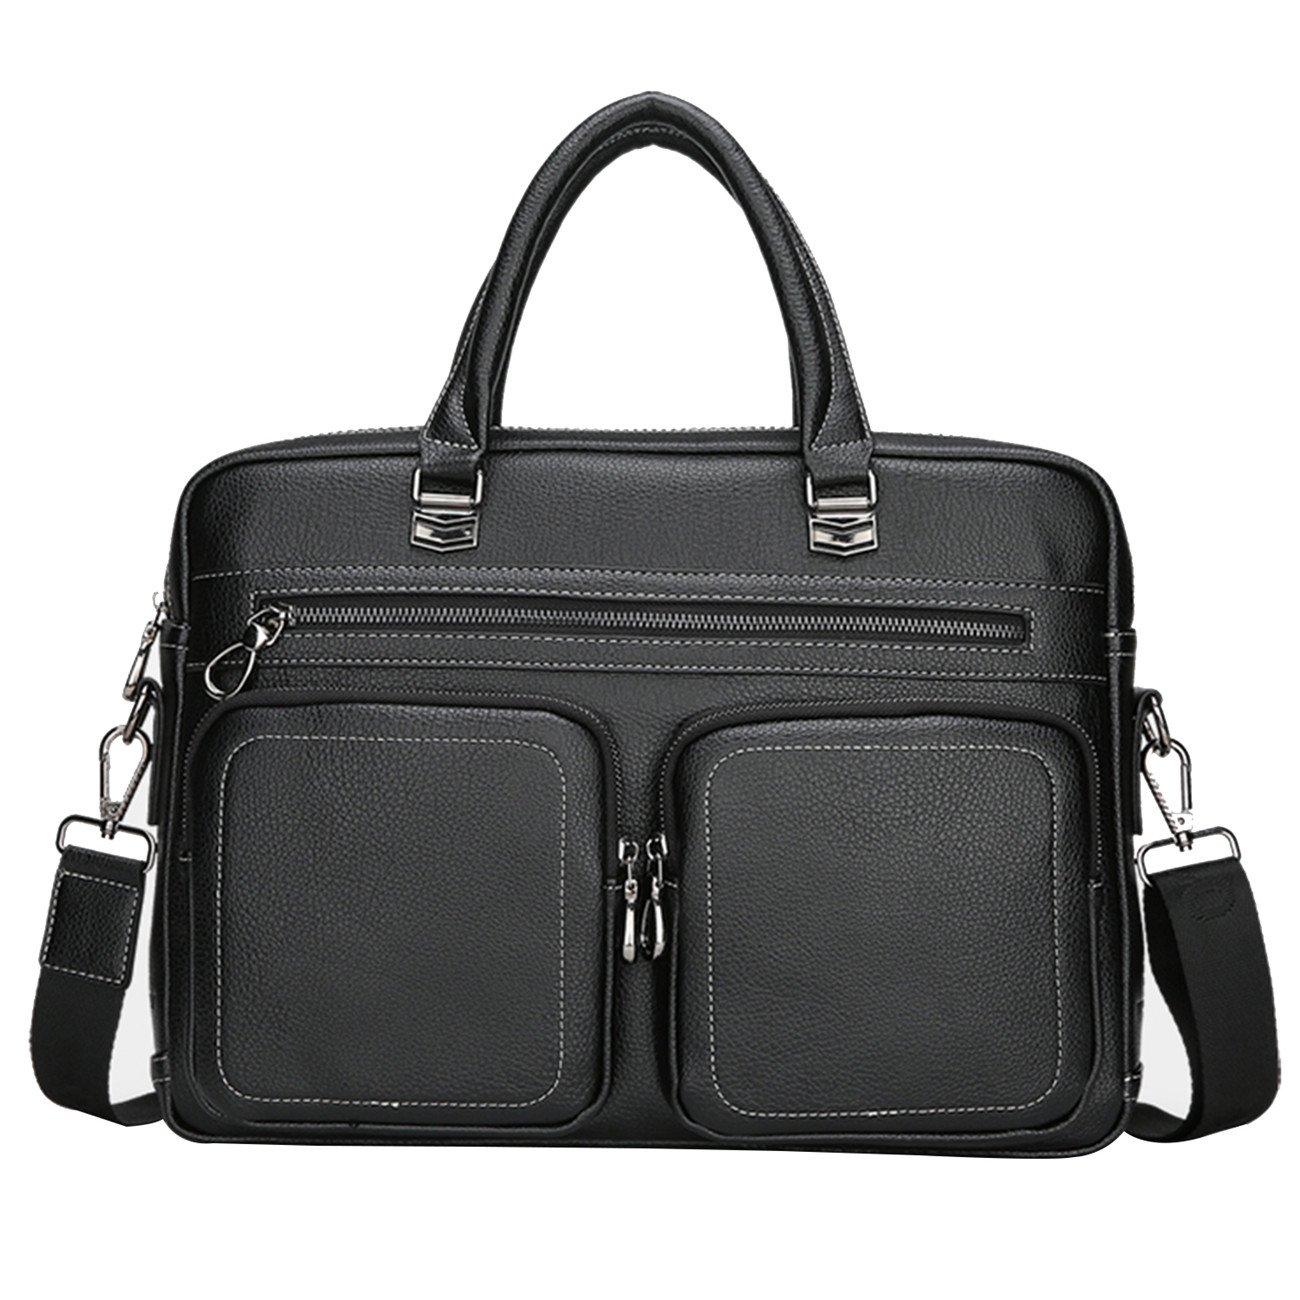 Asge Herren Ledertasche Vintage Handtasche Umhängetasche leder Aktentasche classic messenger bag a4 Arbeitstasche Männer Businesstasche Laptoptasche 15.6 zoll